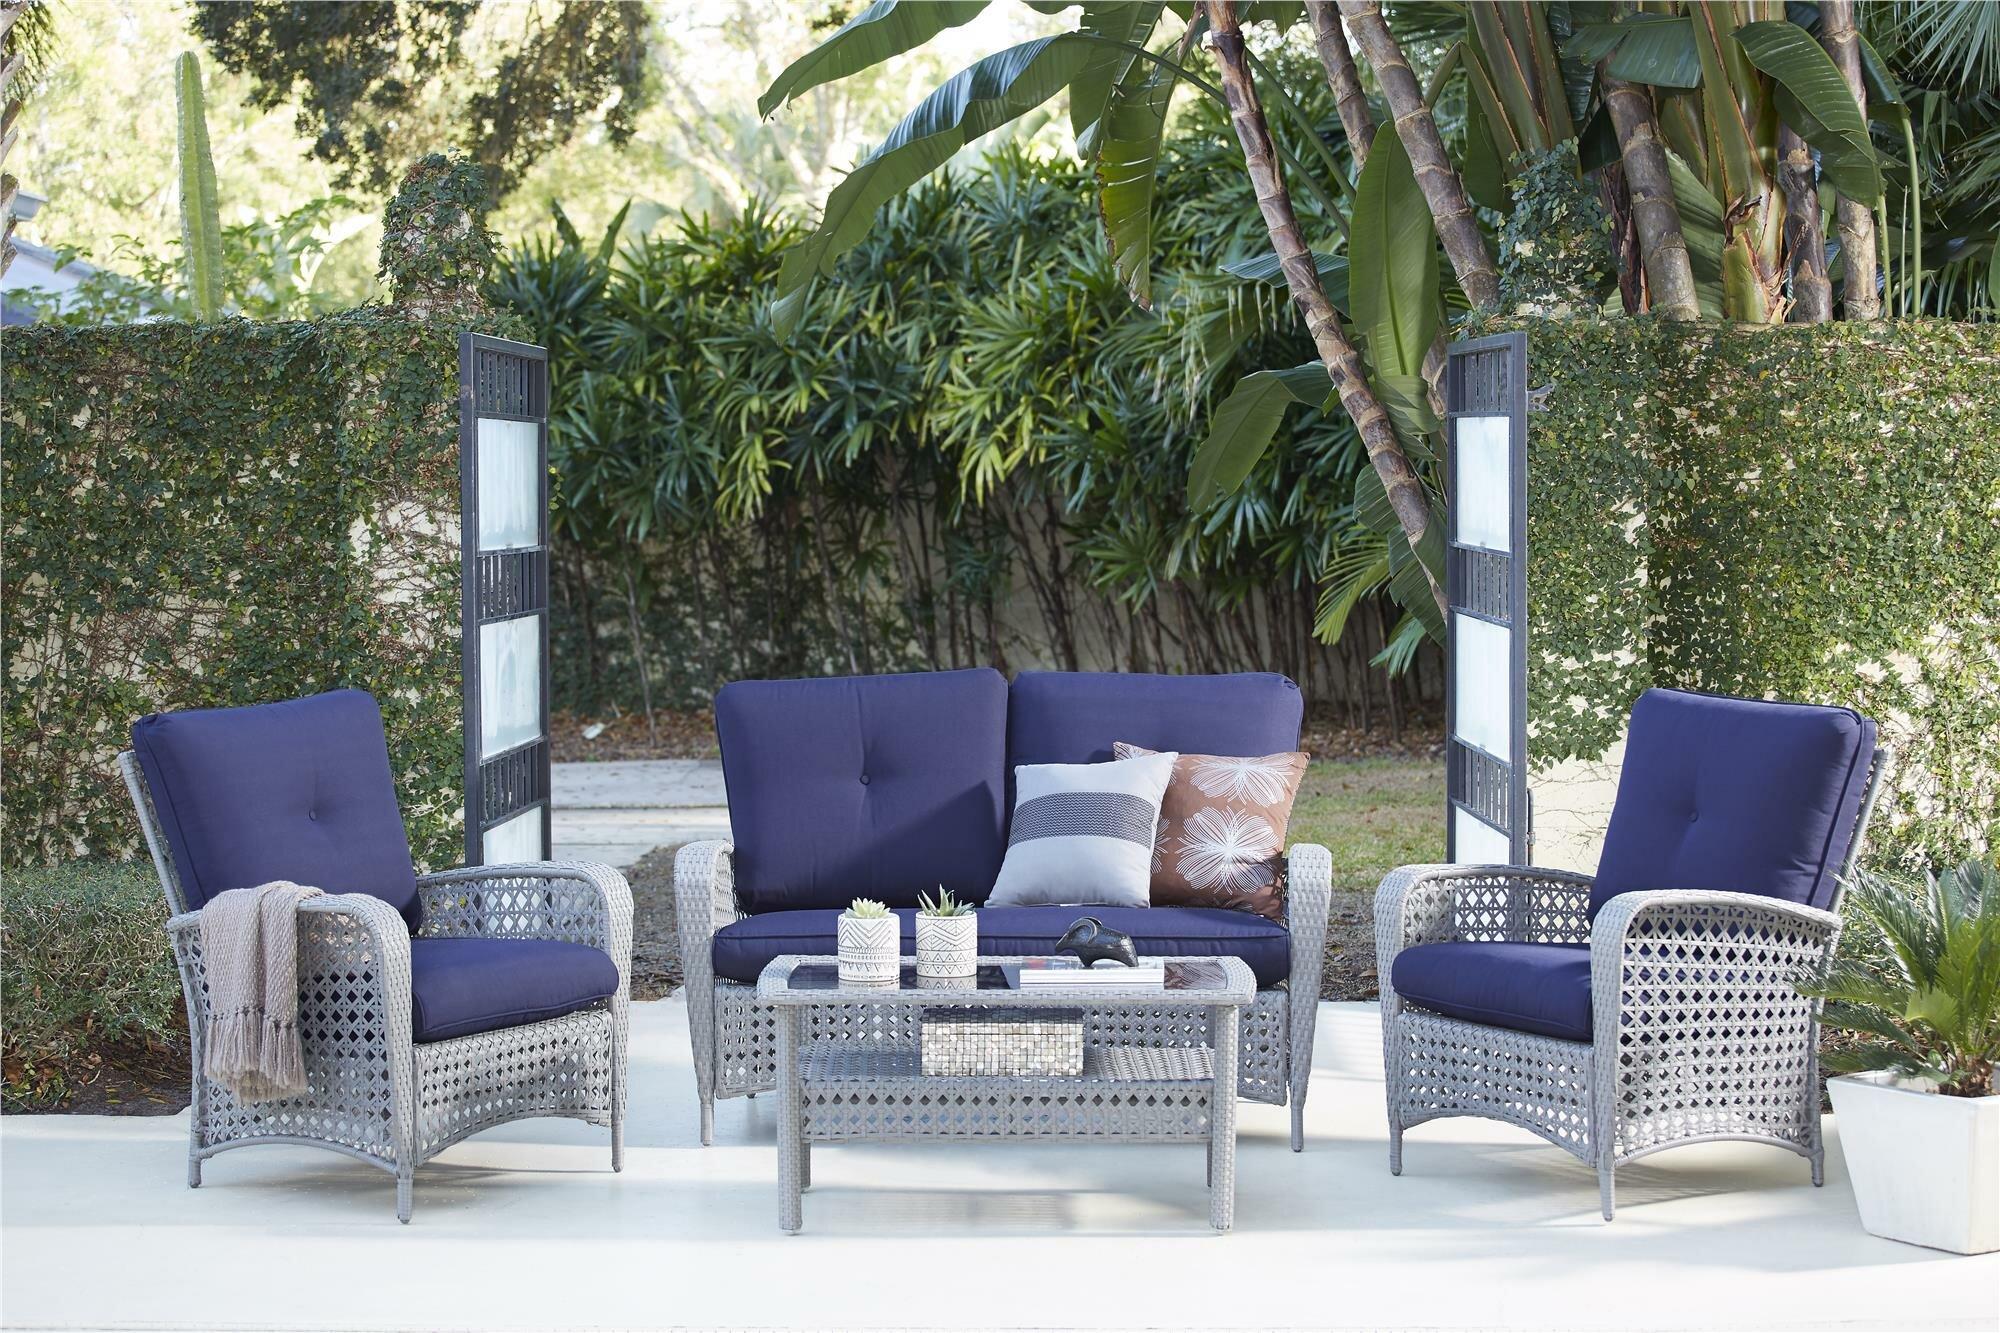 Highland dunes edwards 4 piece rattan sofa seating group with cushions reviews wayfair